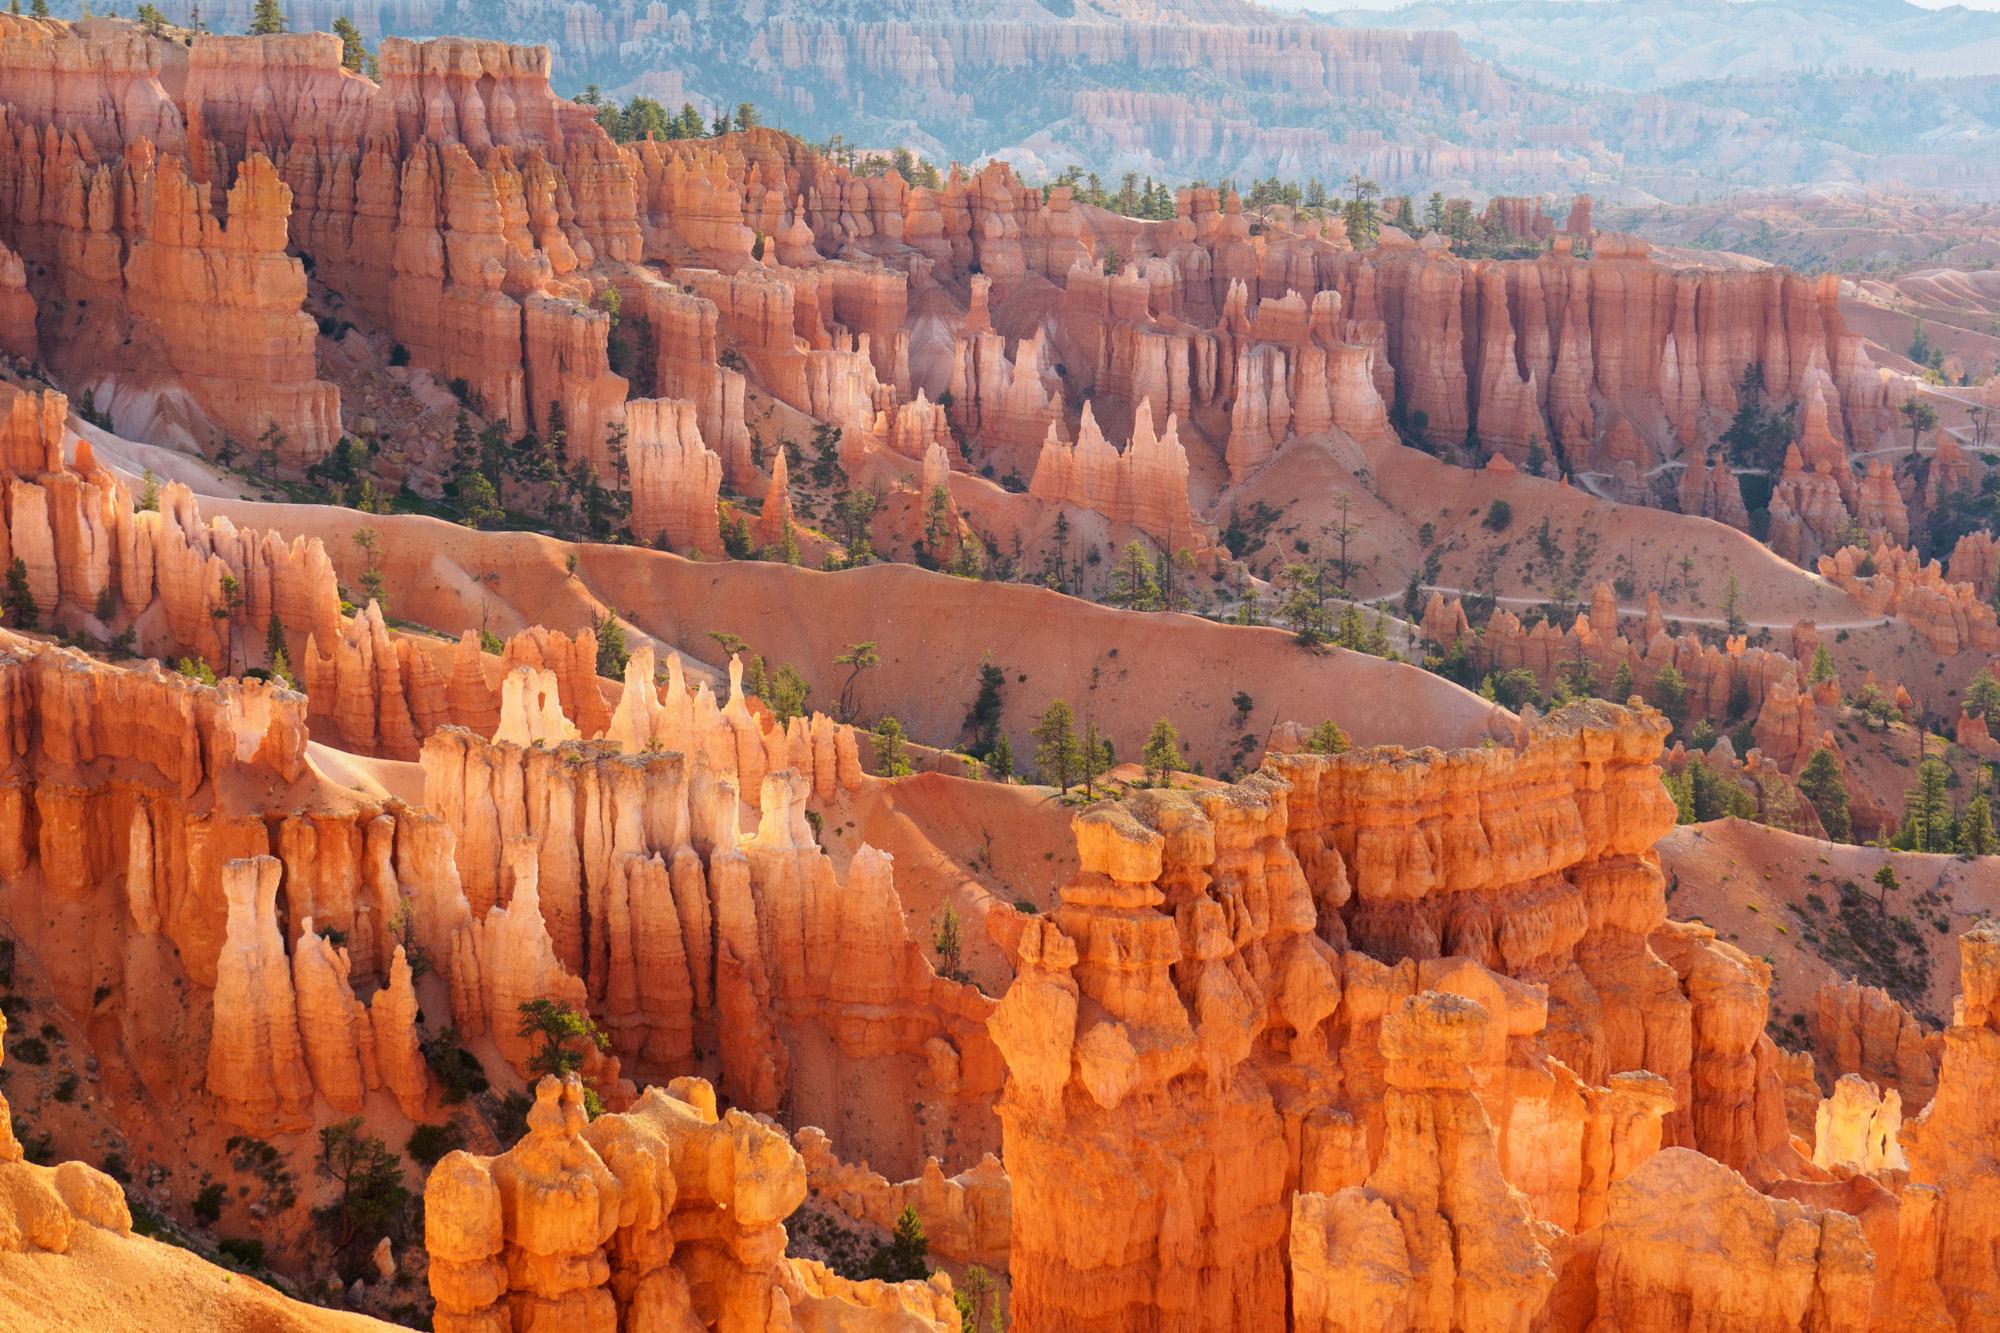 Bryce Canyon Nationalpark - Hoodoos des Bryce Canyon